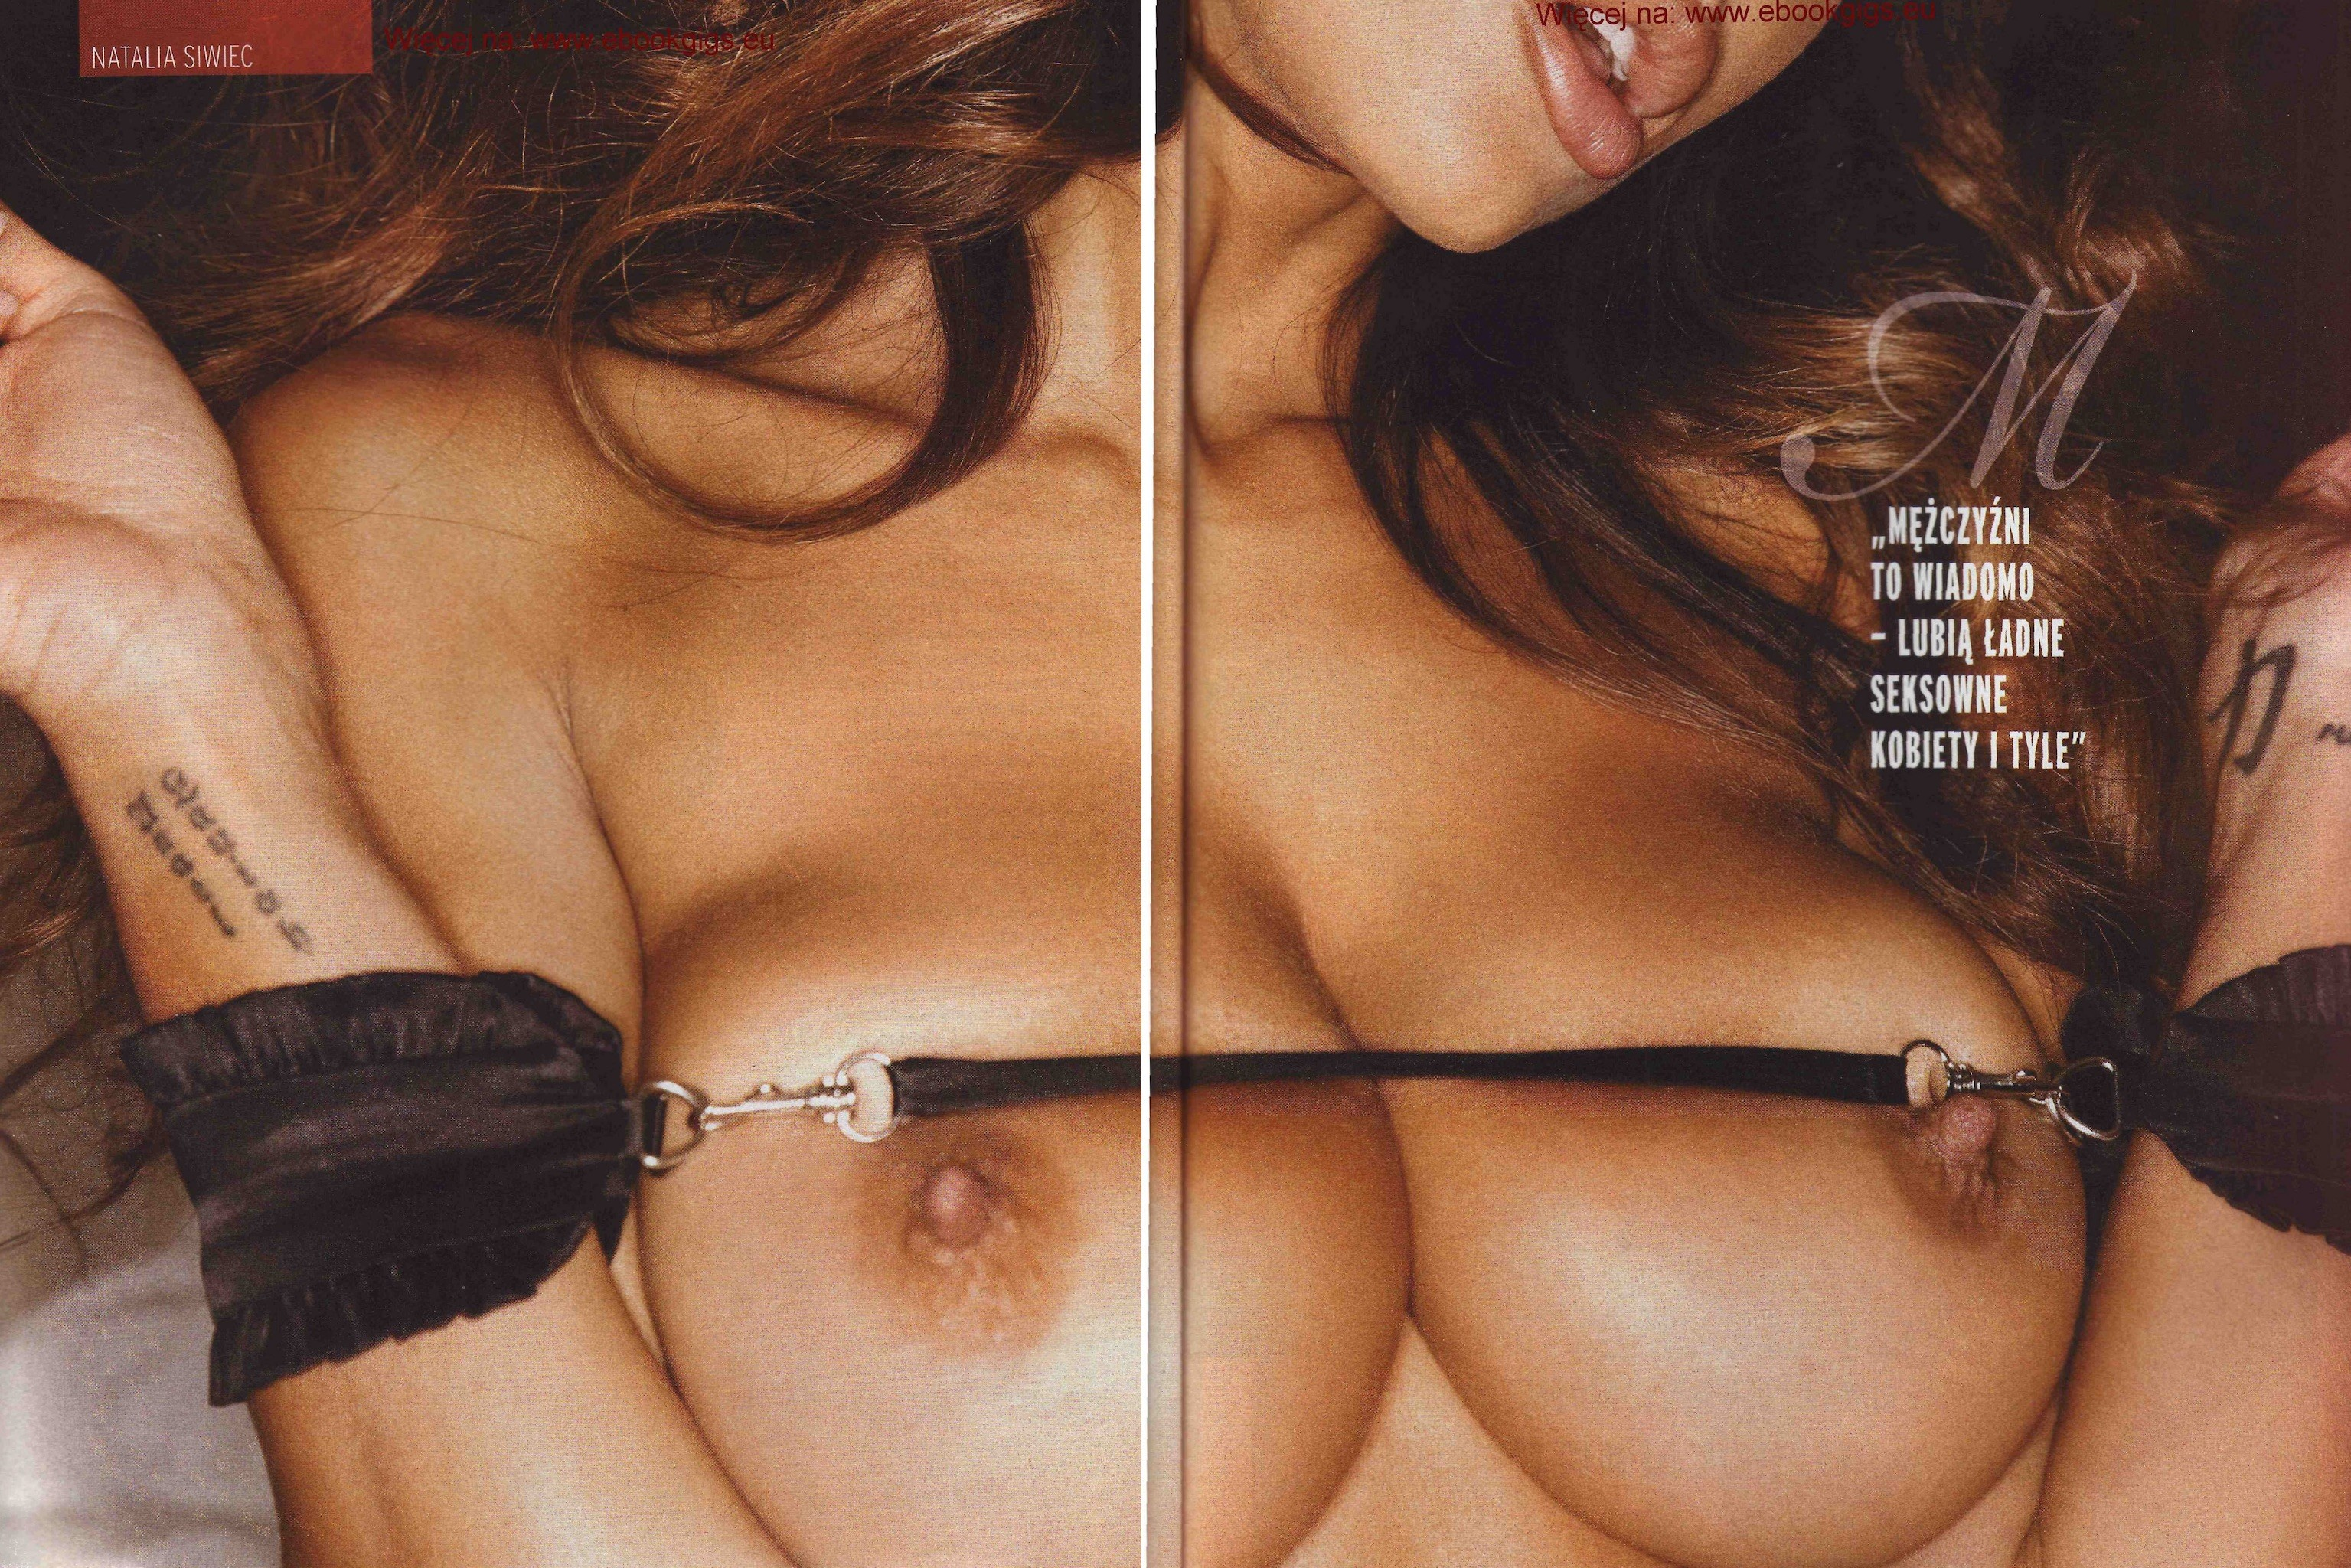 Natalia Siwiec porn